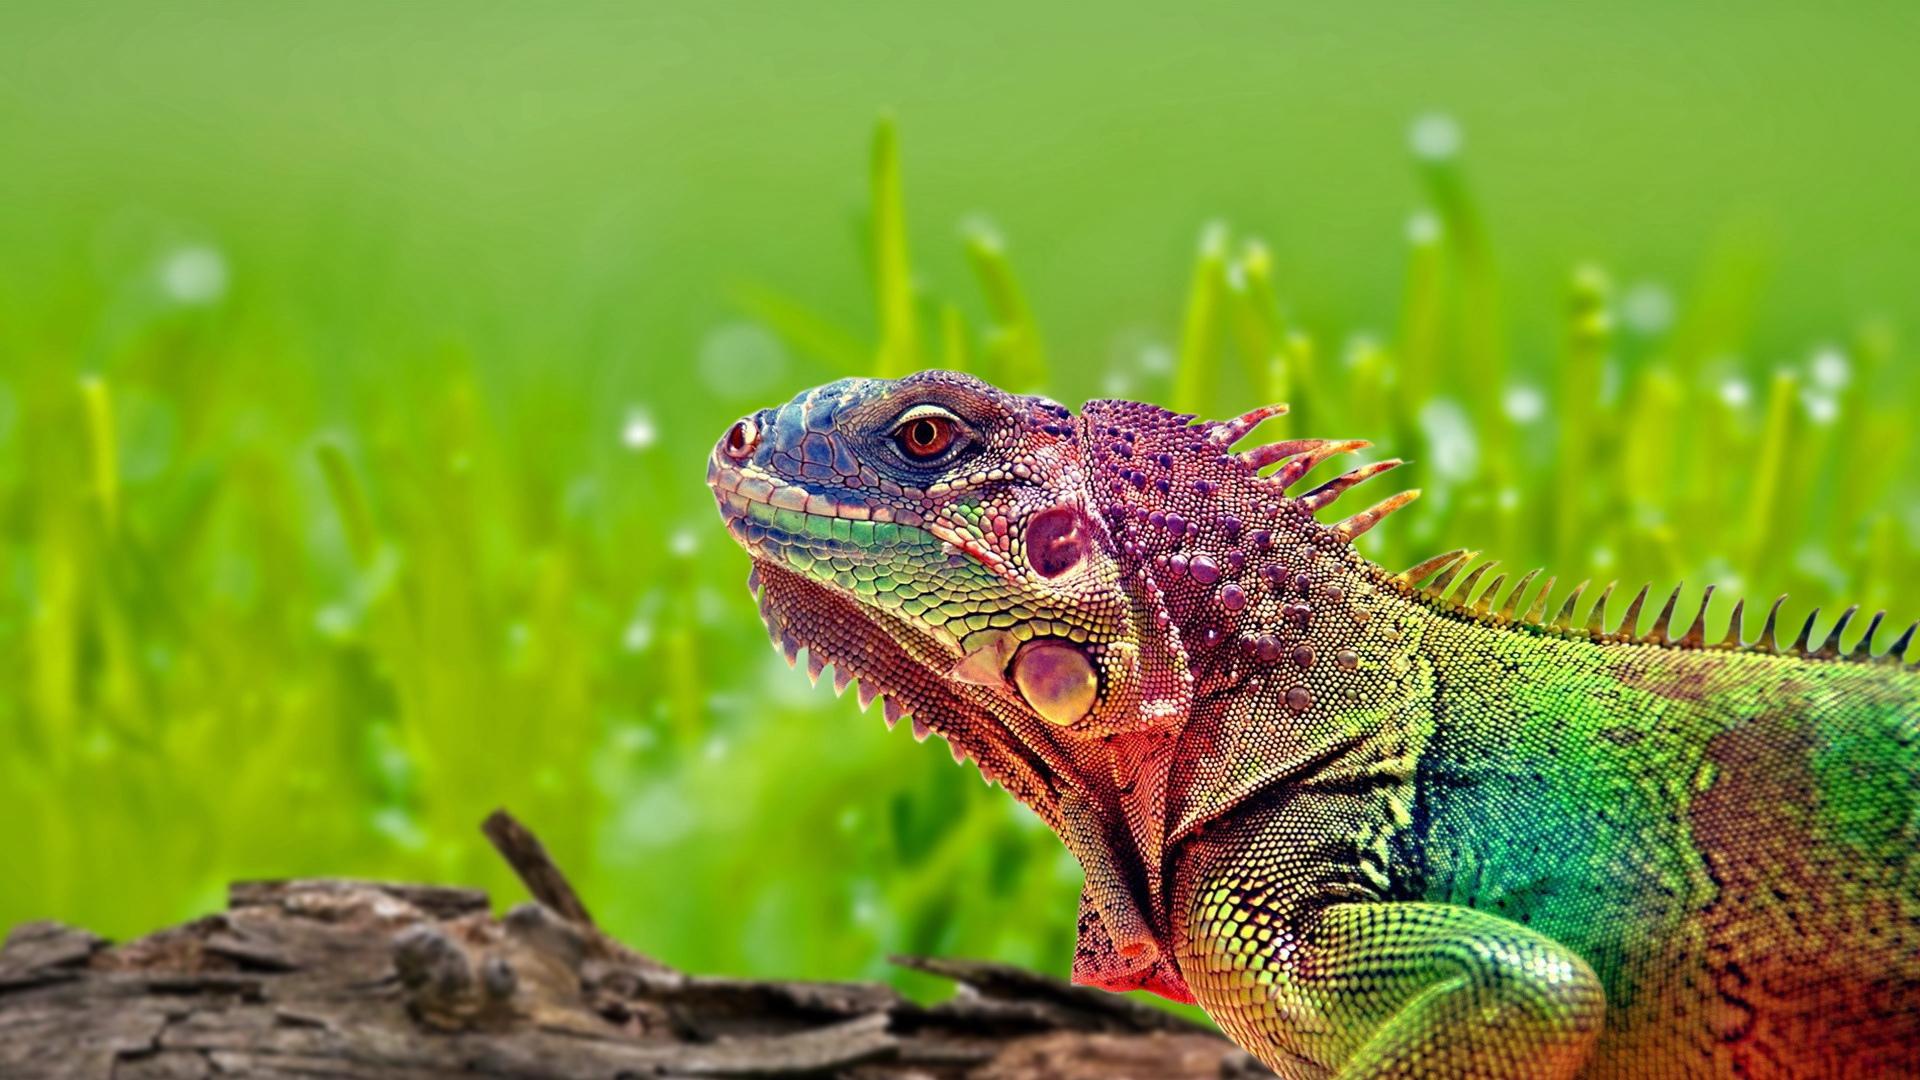 chameleon wallpaper 9661 - photo #15